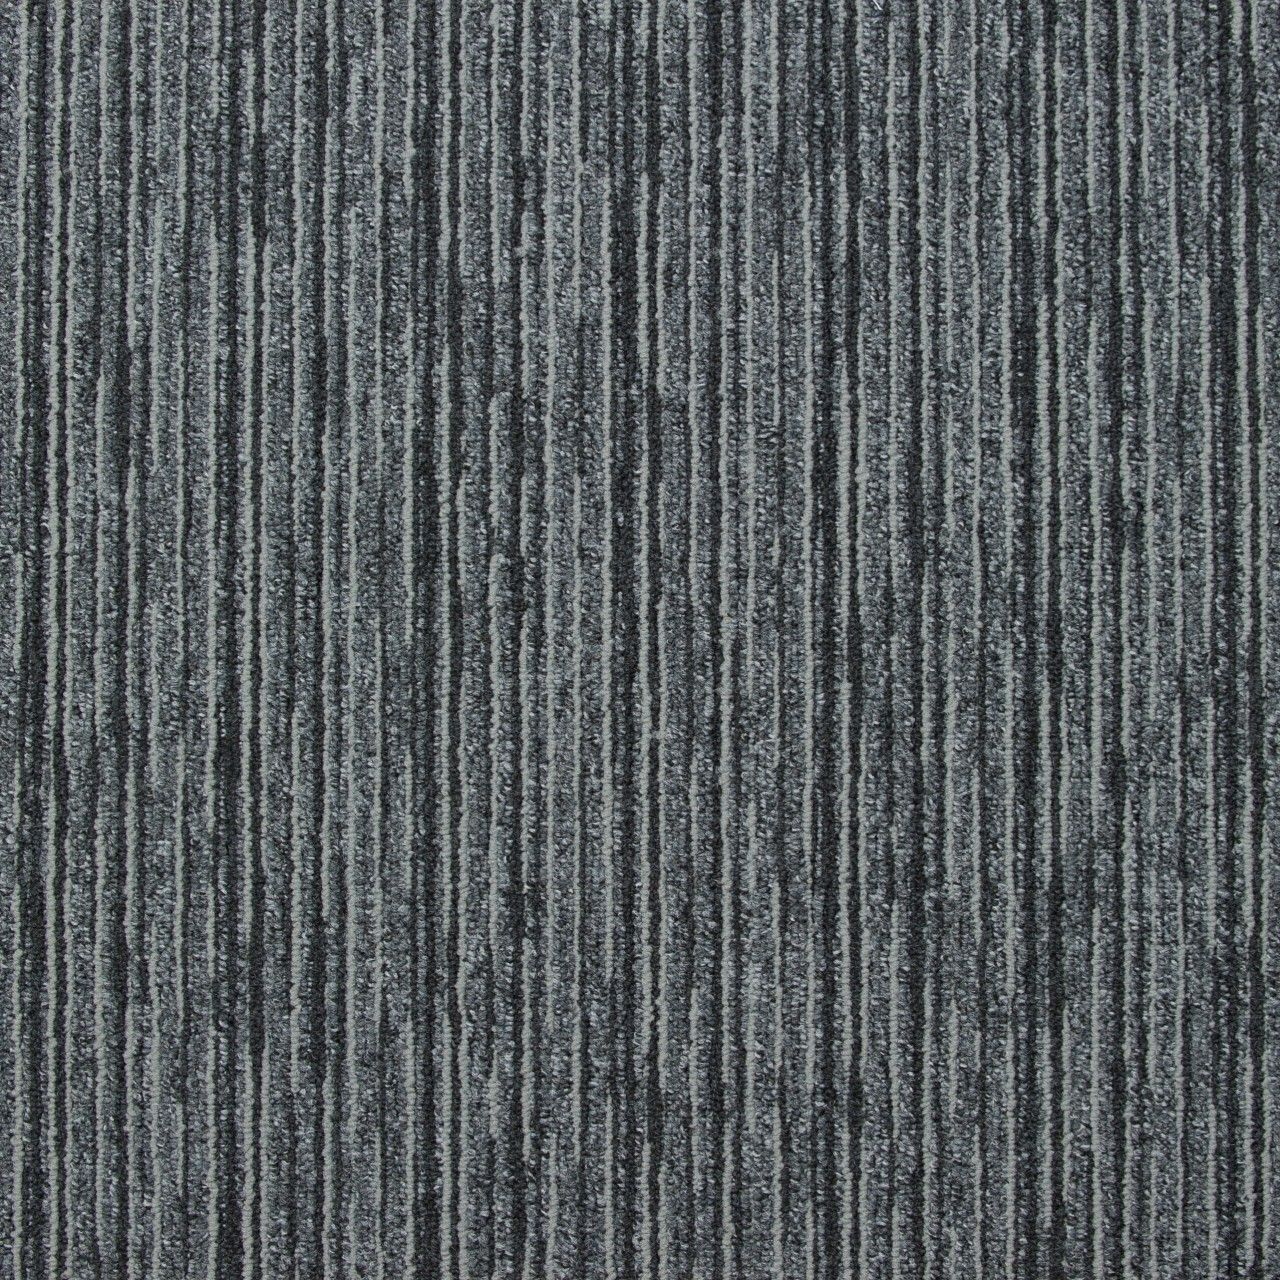 Seamless Office Carpet Texture Google Search Hinh ảnh Vải